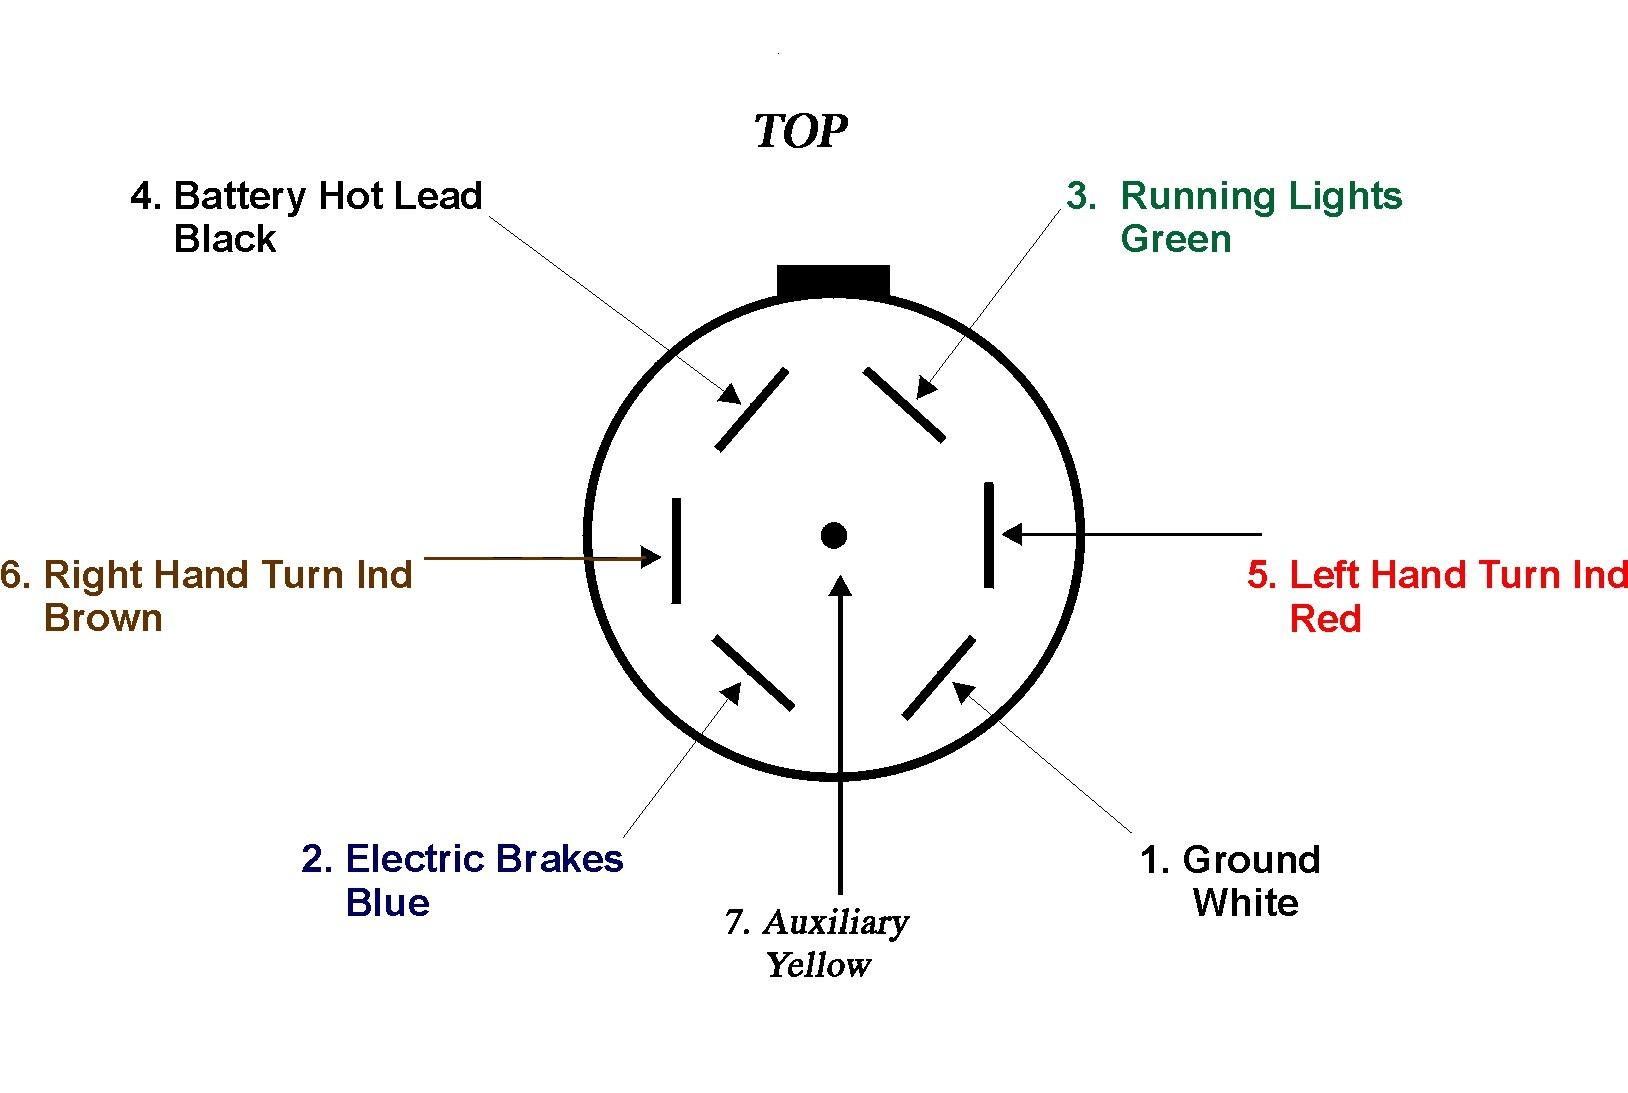 4 Wire Trailer Wiring Diagram Unique 7 Pin Trailer Plug Wiring Diagram Canada Wiring solutions